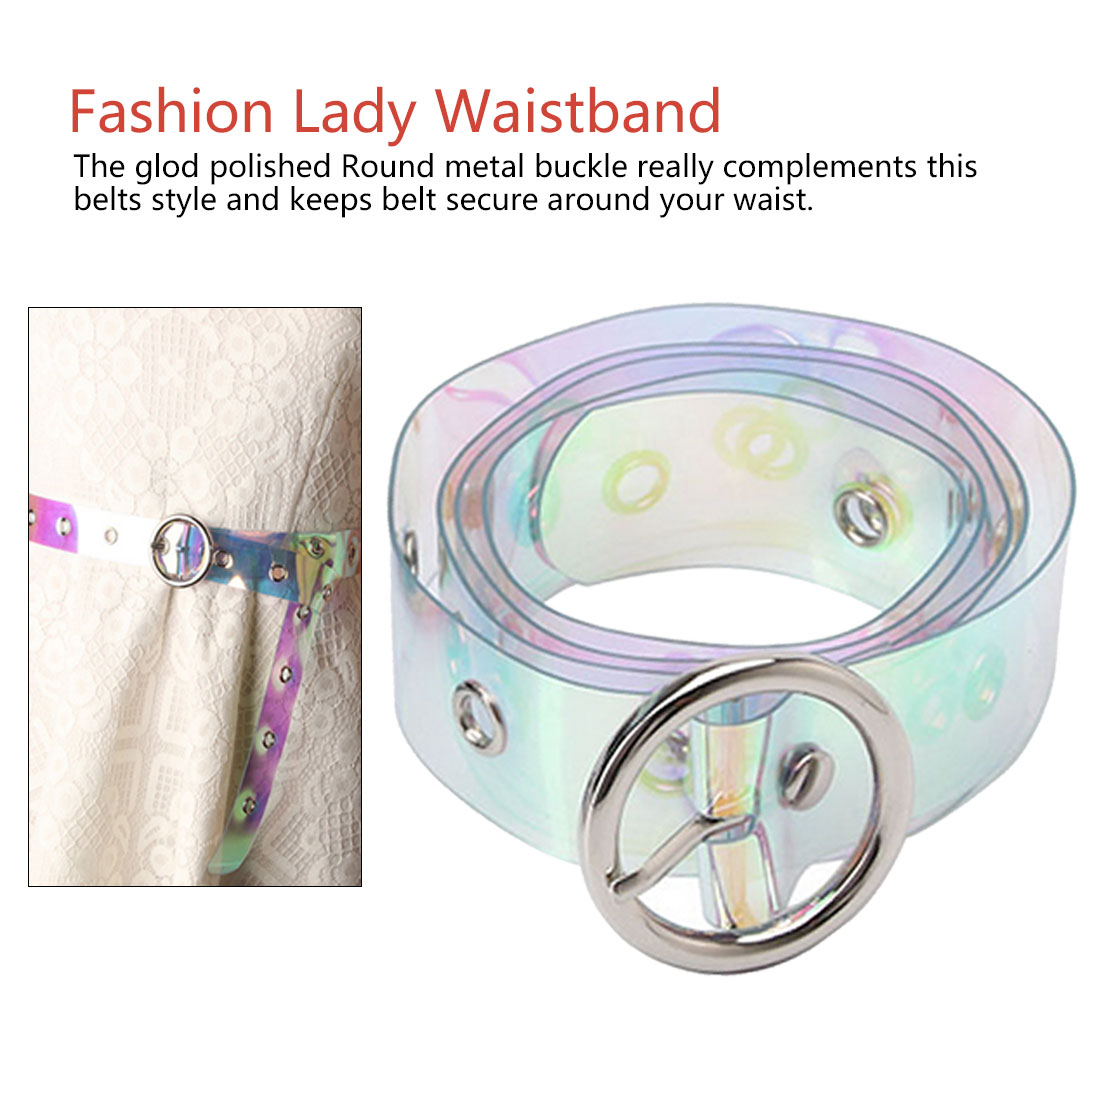 New 1Pc Transparent Laser Holographic Belt Punk Buckle Wide Waist Belt Circle Waistband Wedding Dress Accessories in Women 39 s Belts from Apparel Accessories